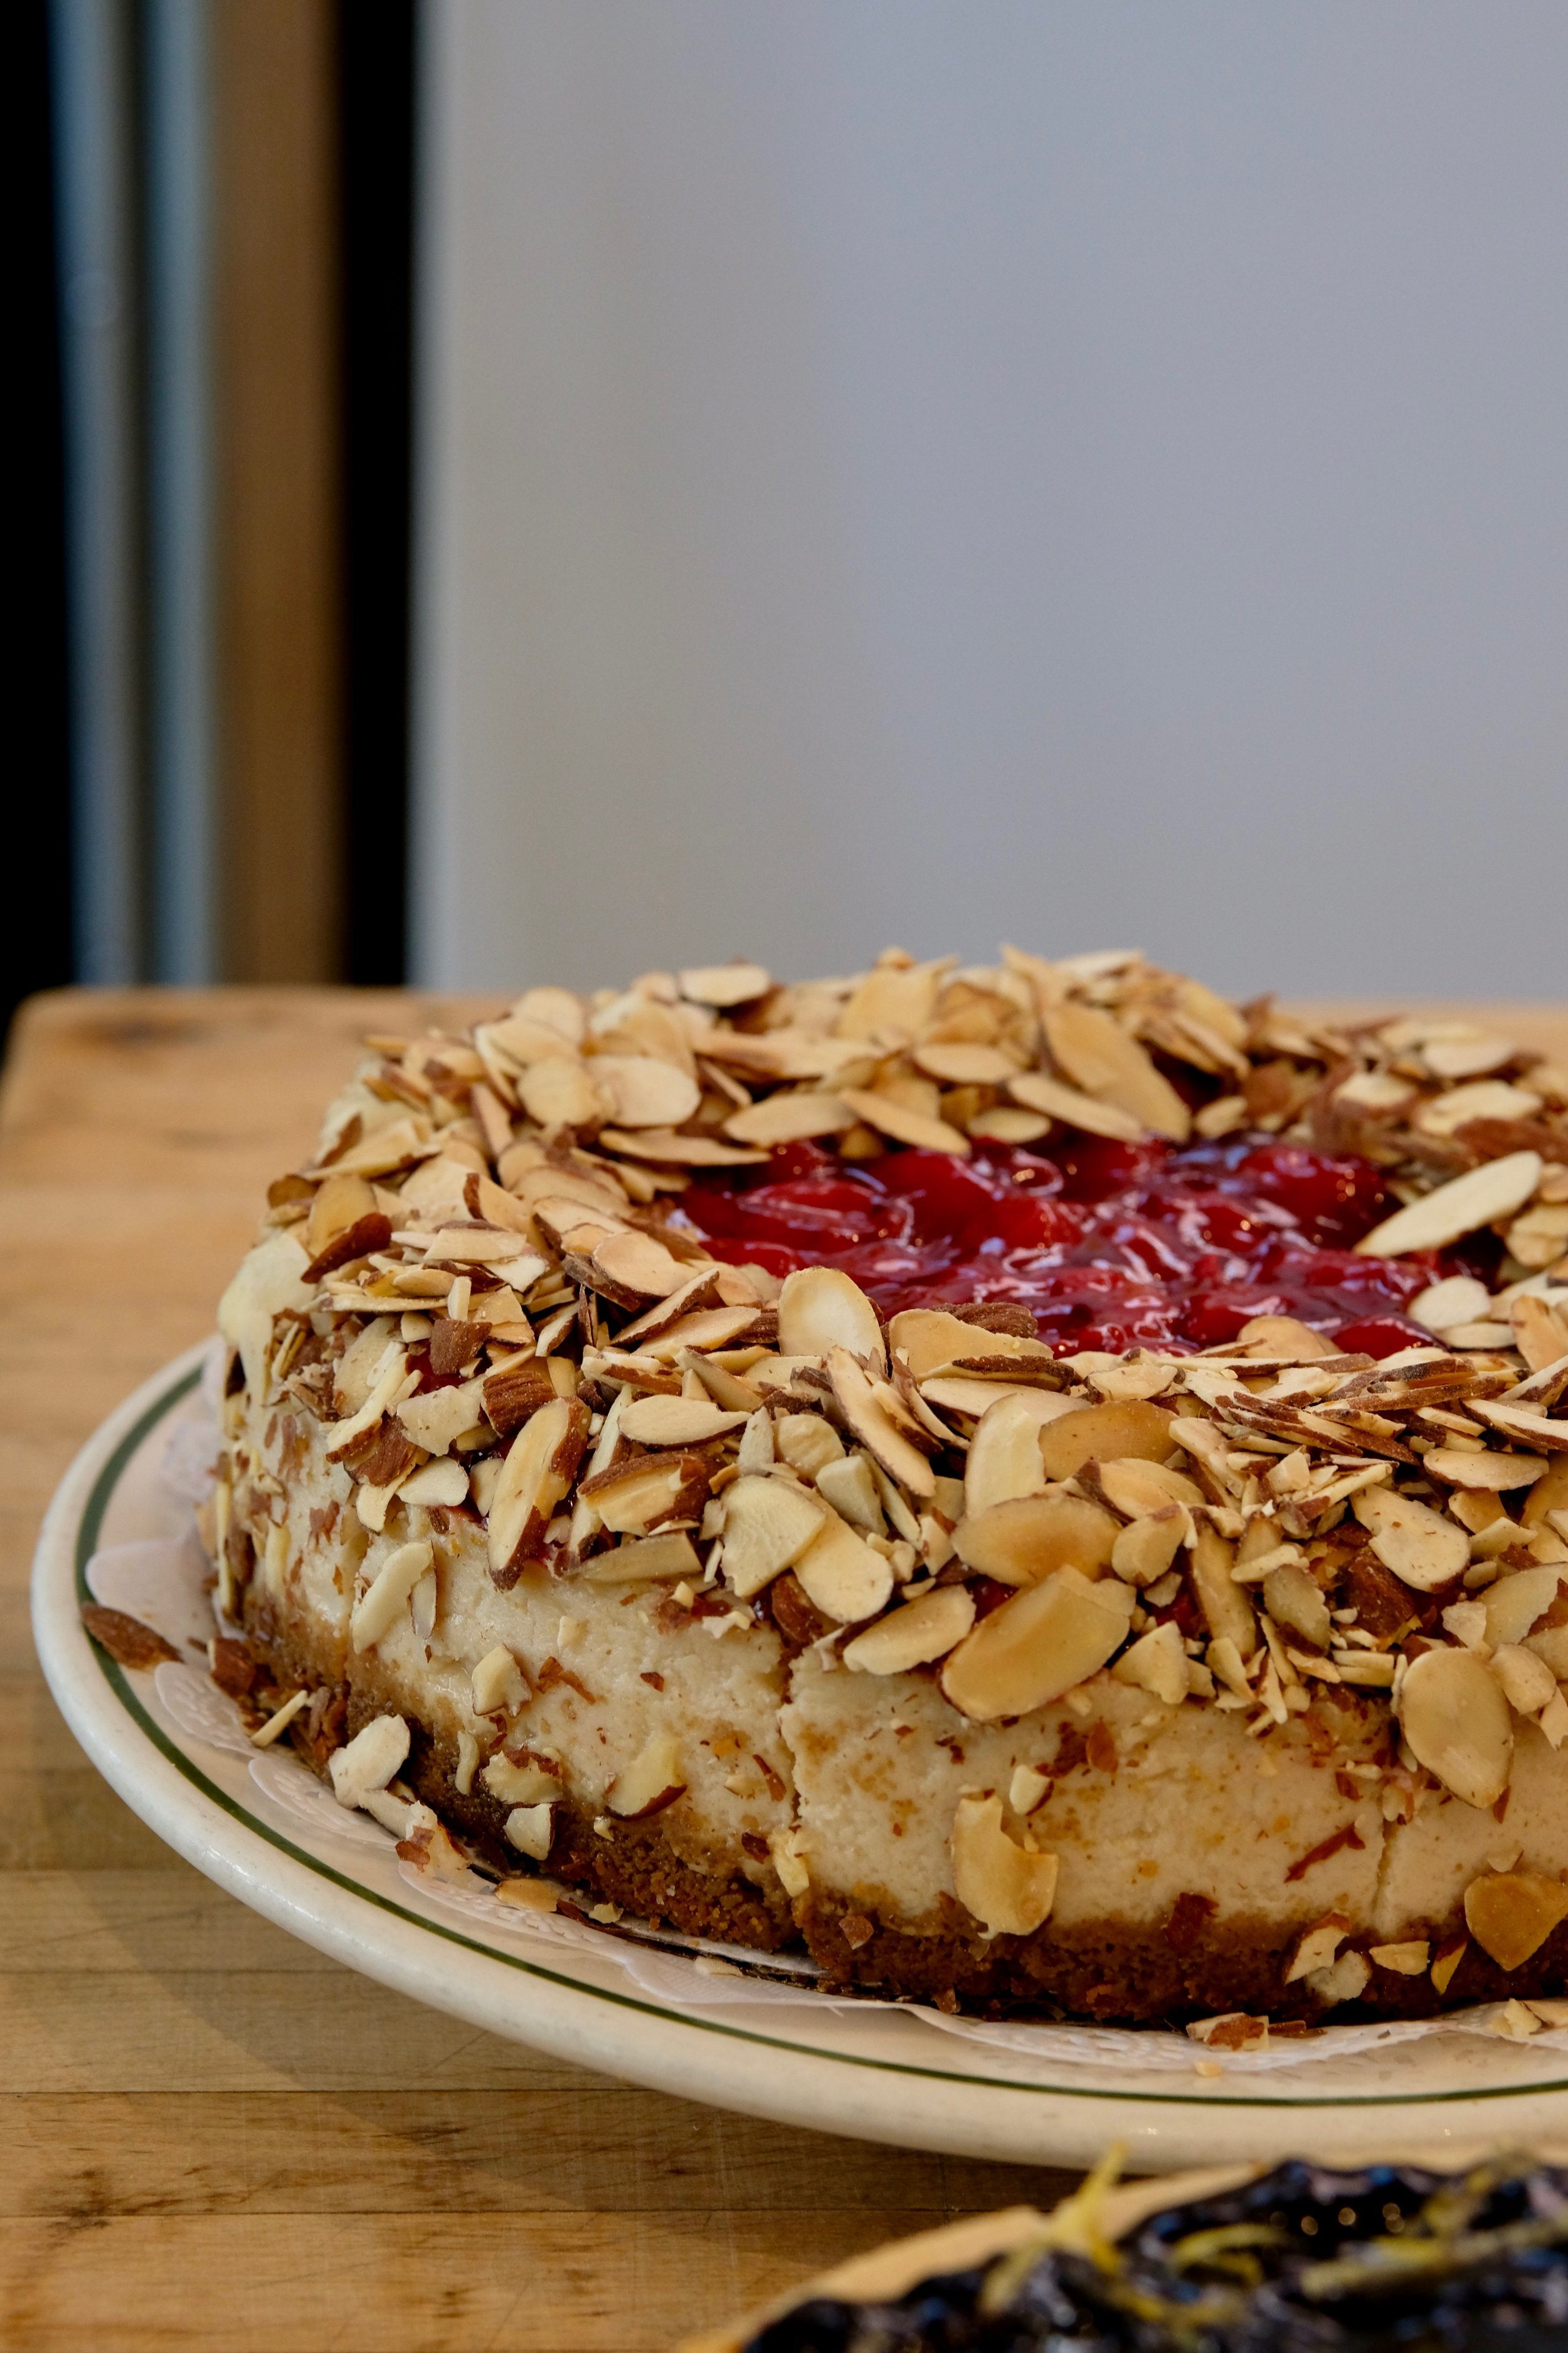 Cherry almond cheesecake